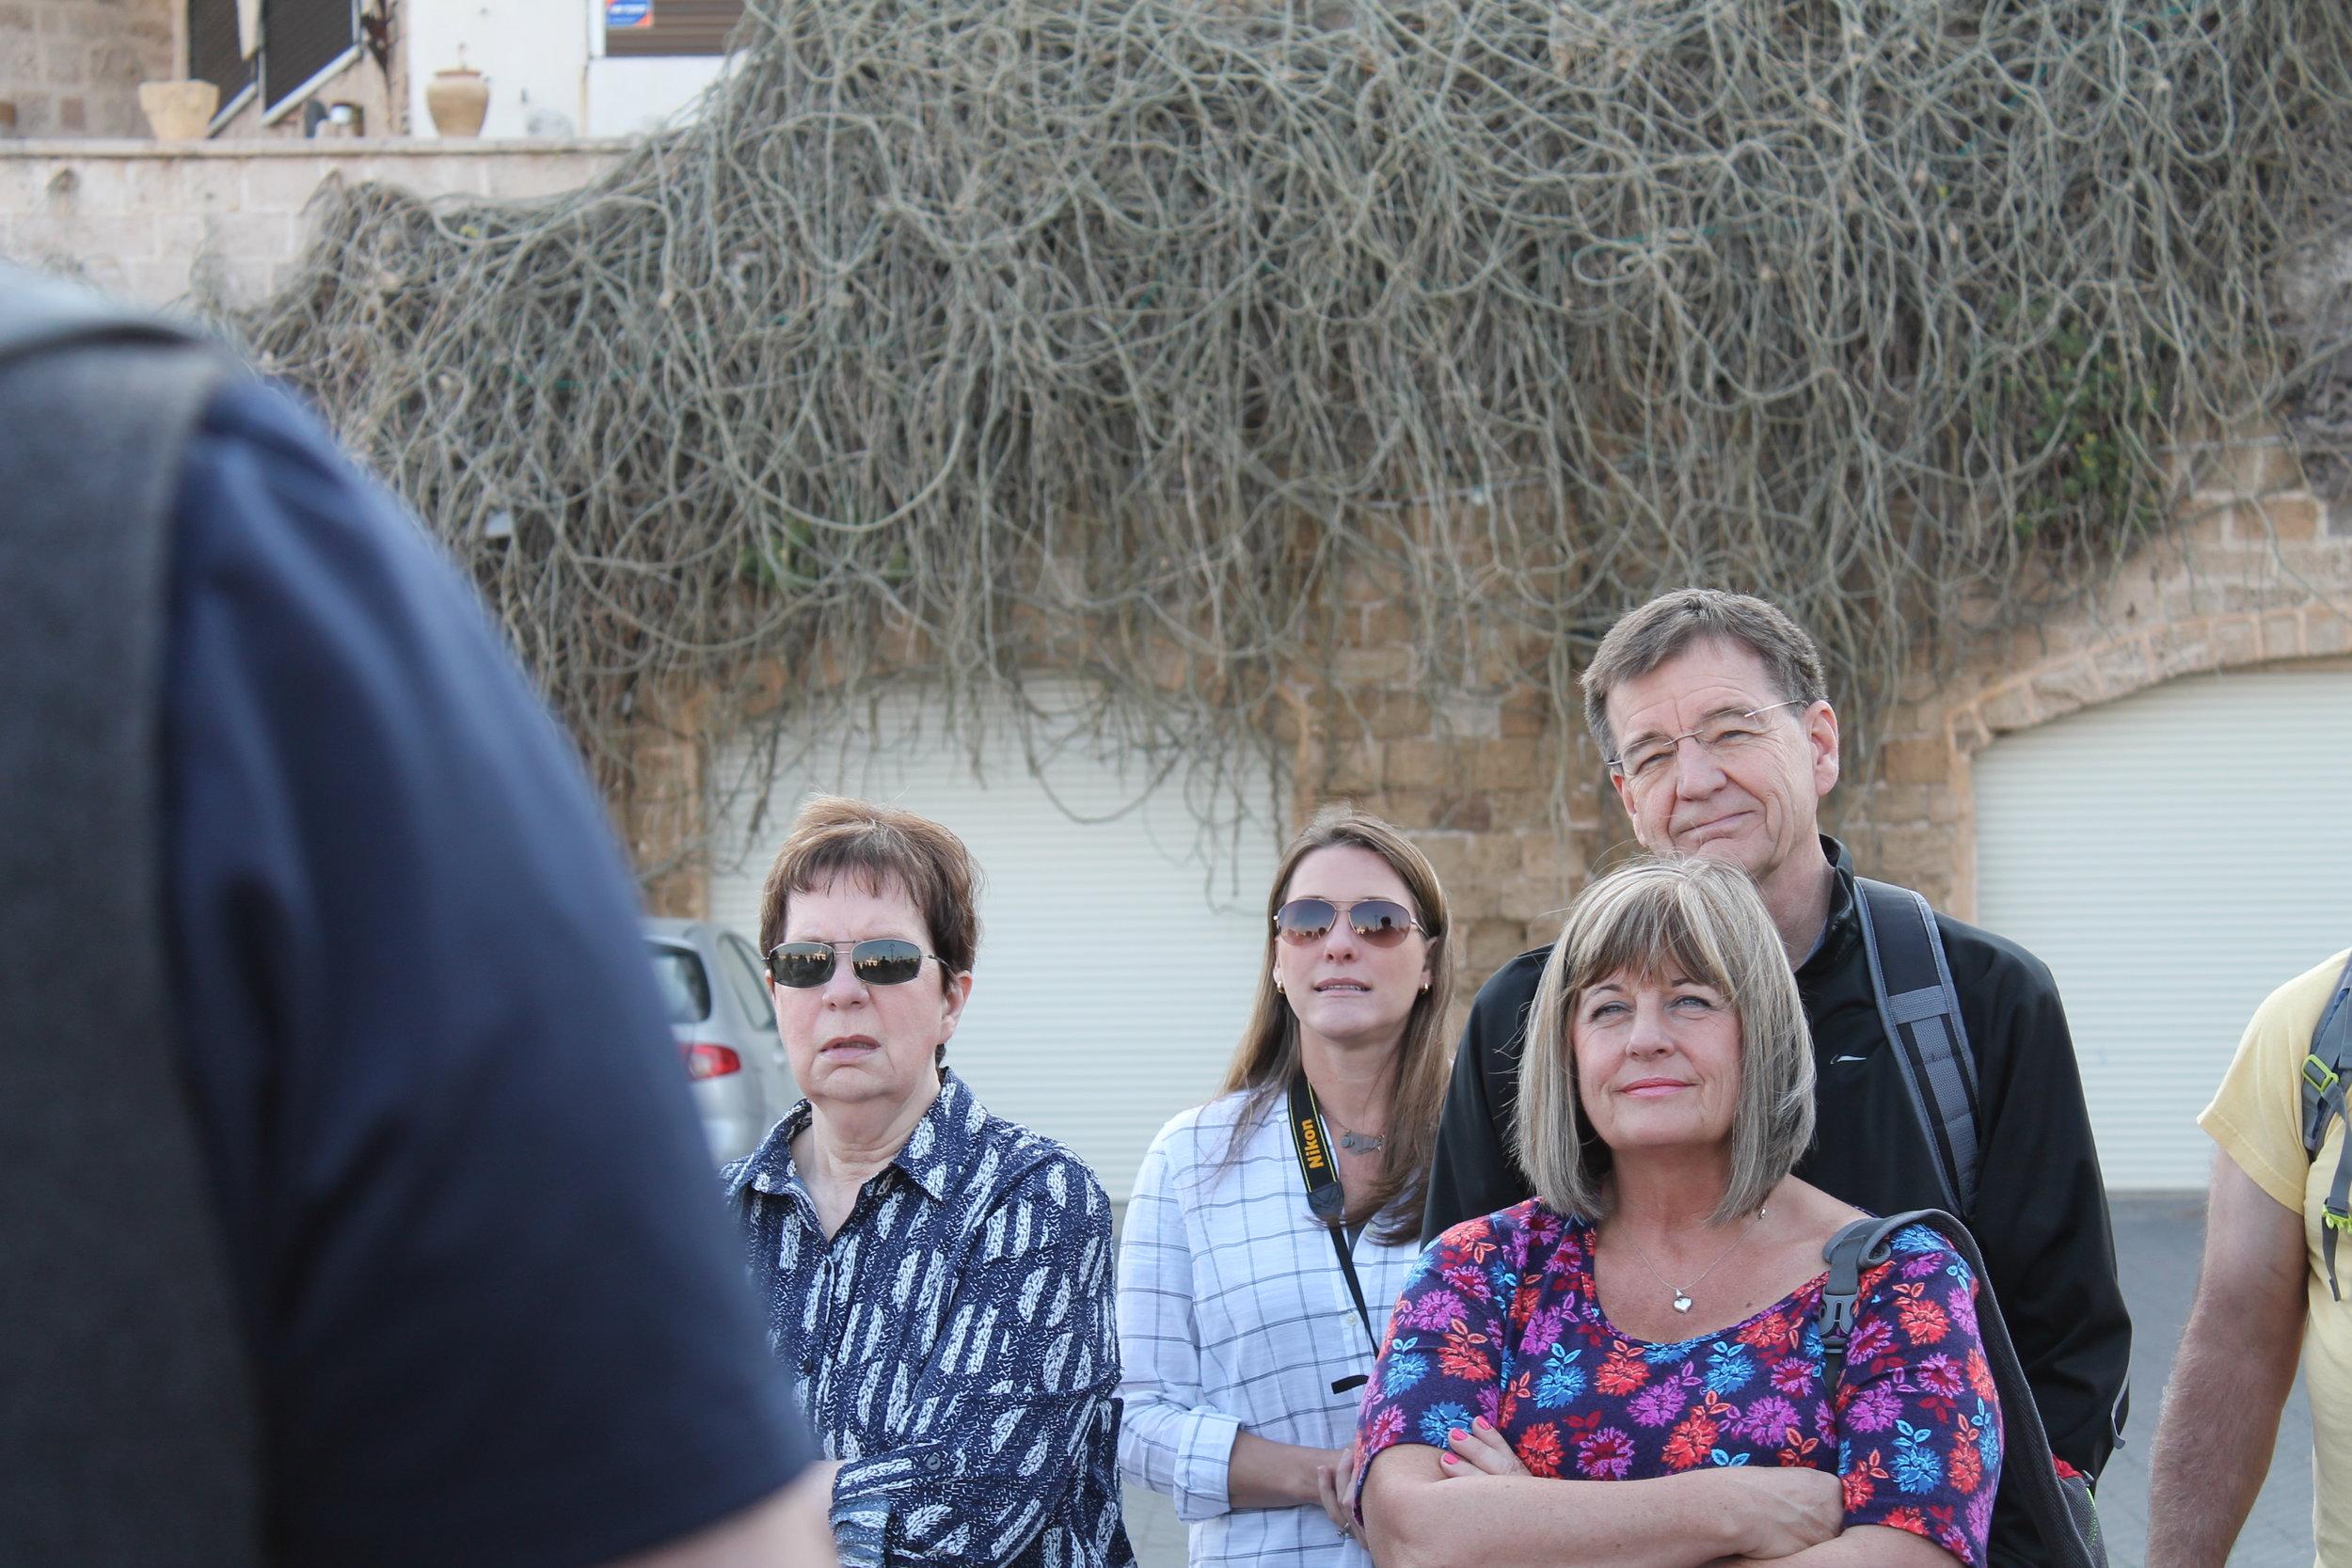 Listening to Ken Wilmot explain the history of Joppa (modern Jaffa).